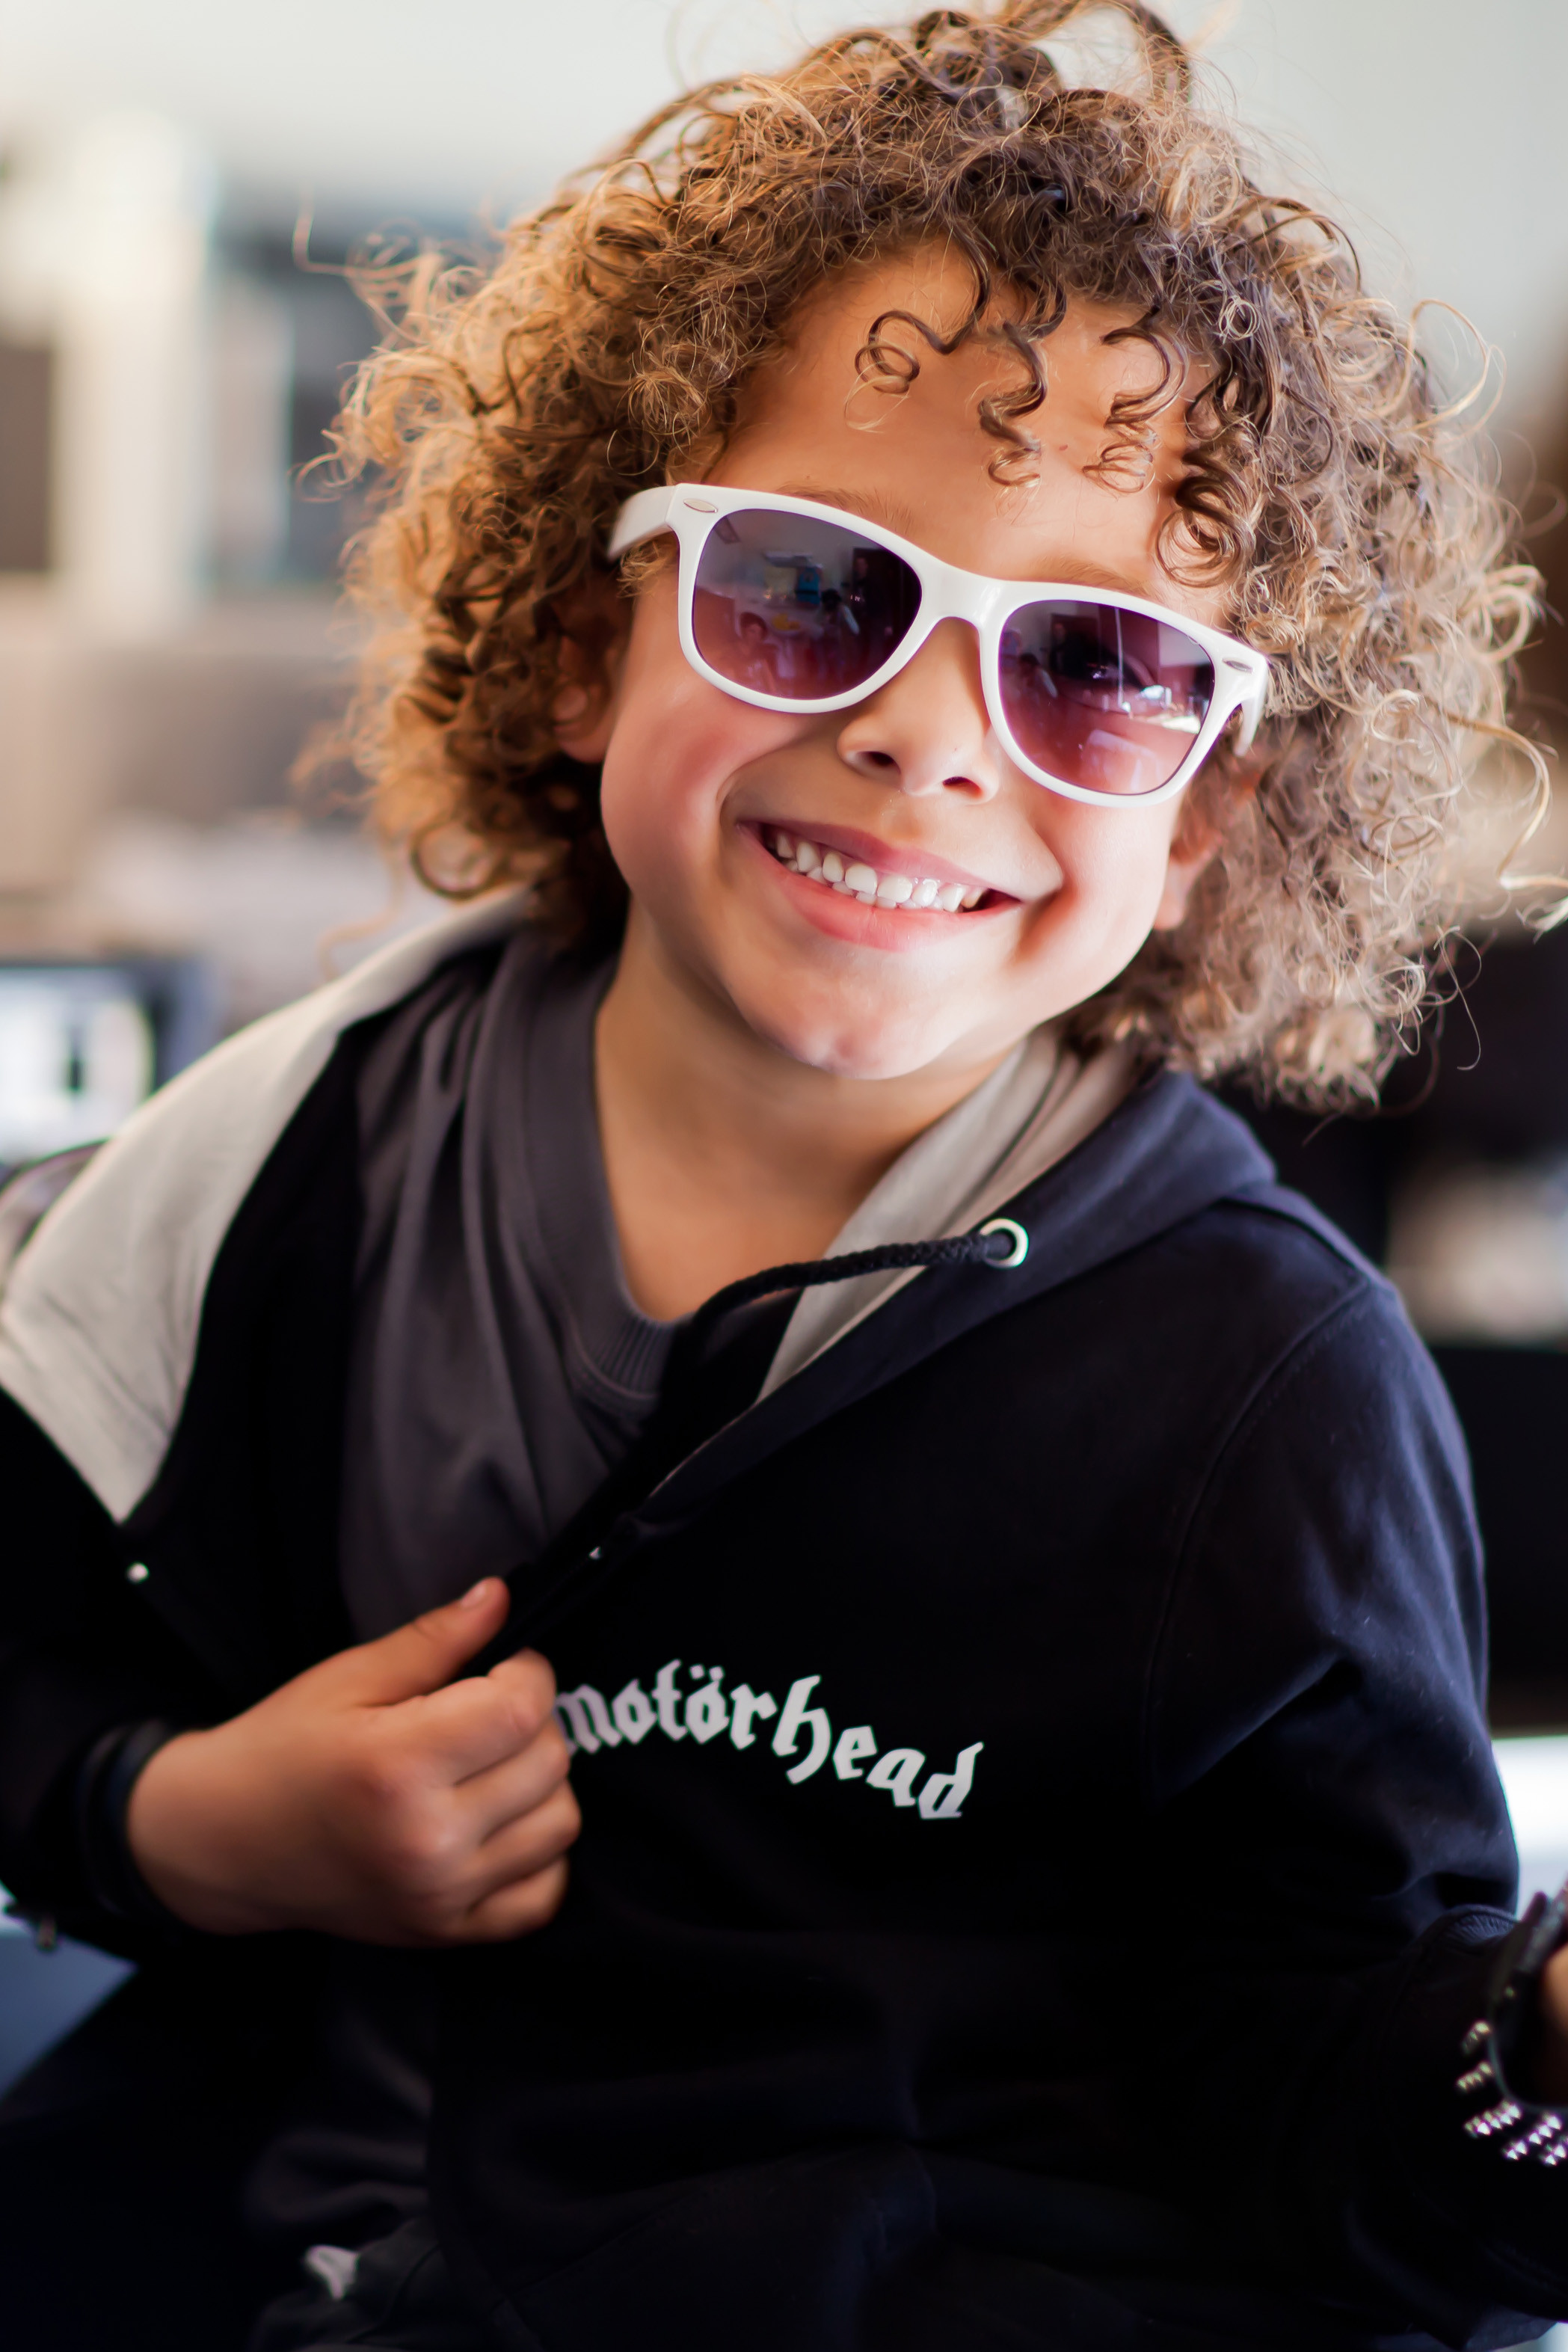 Motorhead Kids Clothes Metal